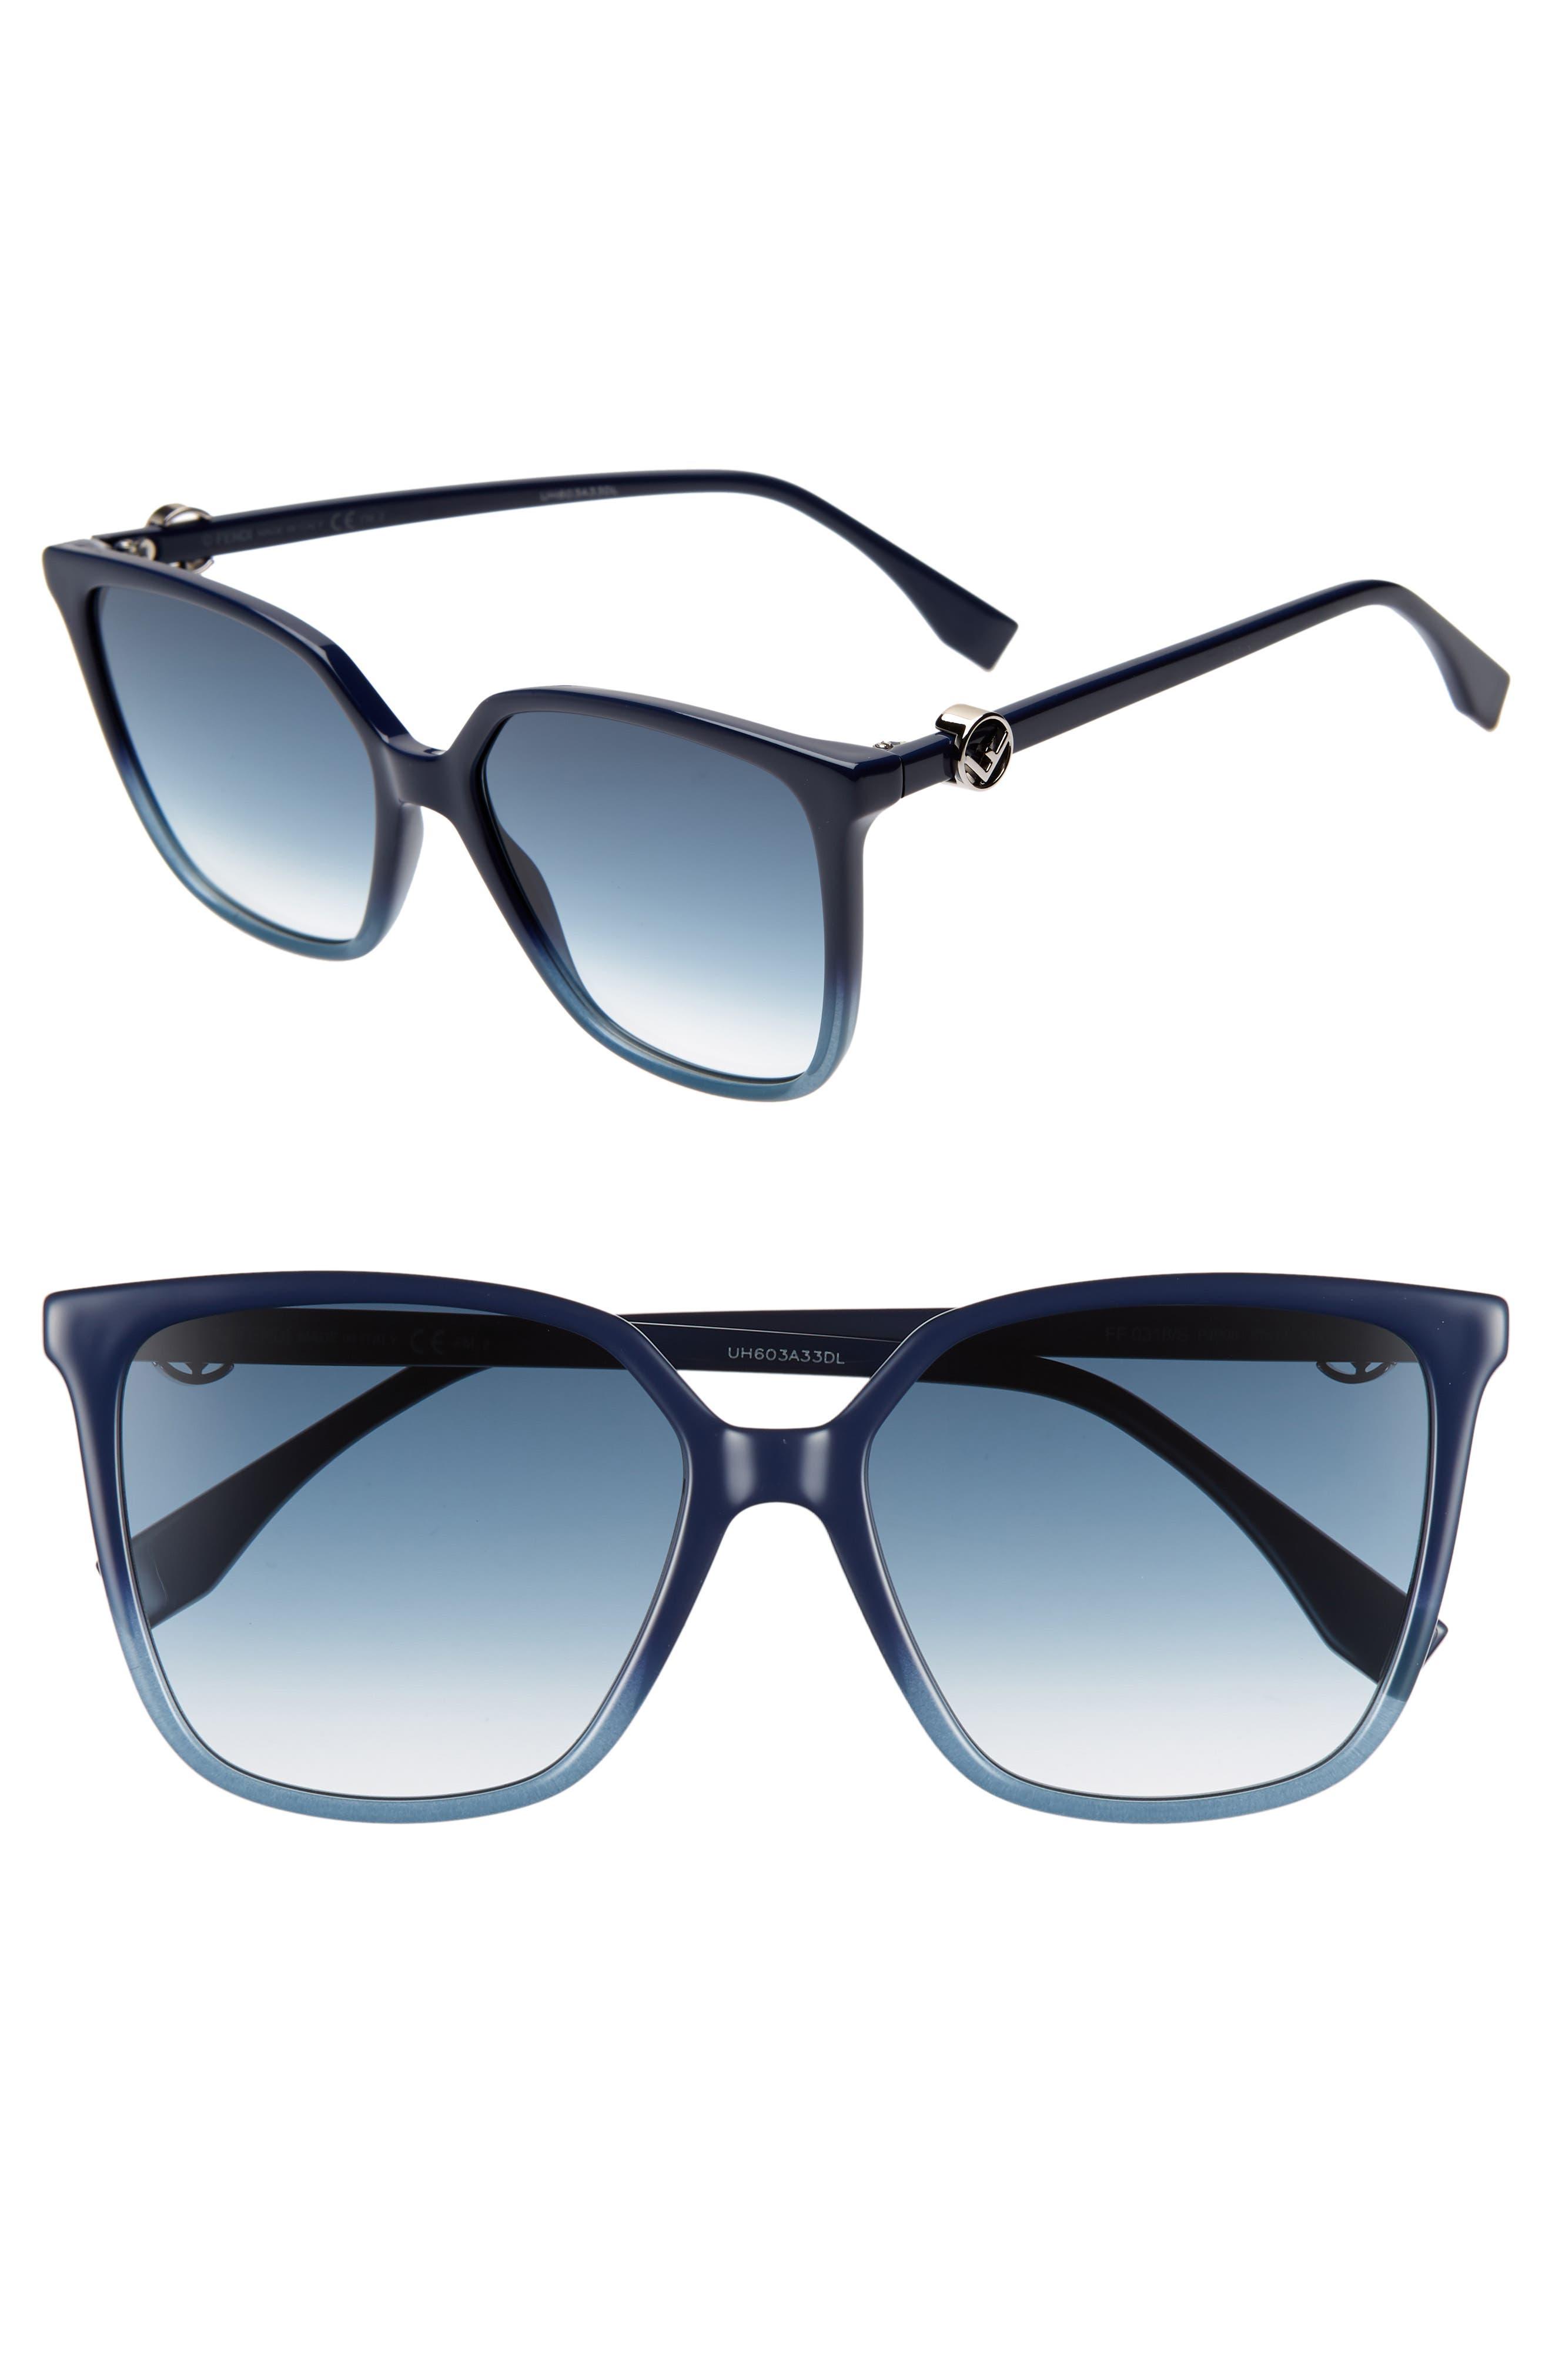 57mm Sunglasses,                             Main thumbnail 1, color,                             BLUE